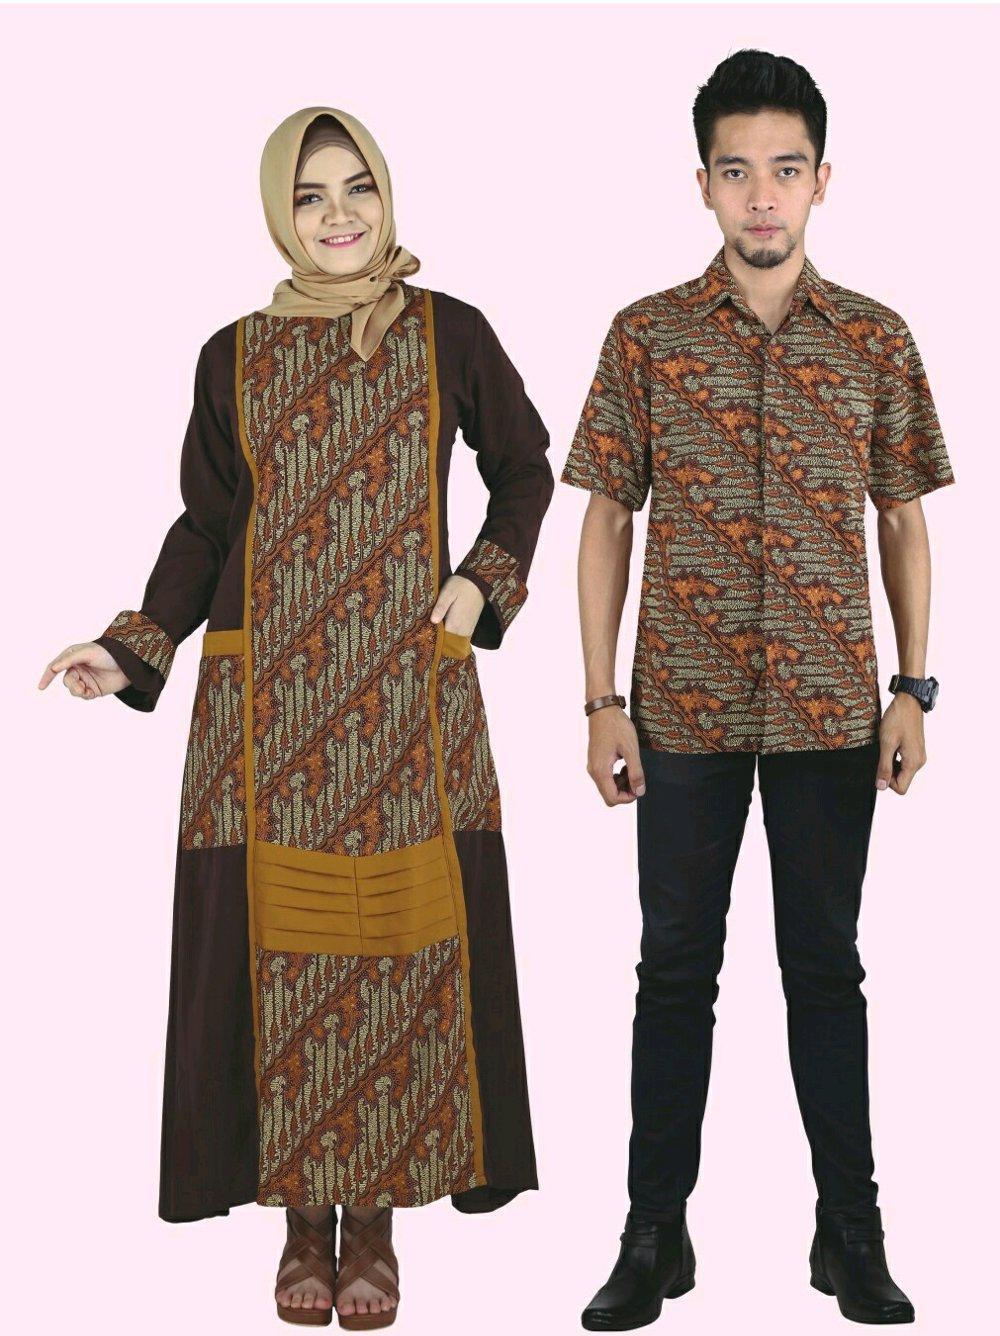 Baju Muslim COUPLE Raindoz 2175 2176 di lapak DISTRO GROSIR MURAH BANDUNG sepatumurahnian